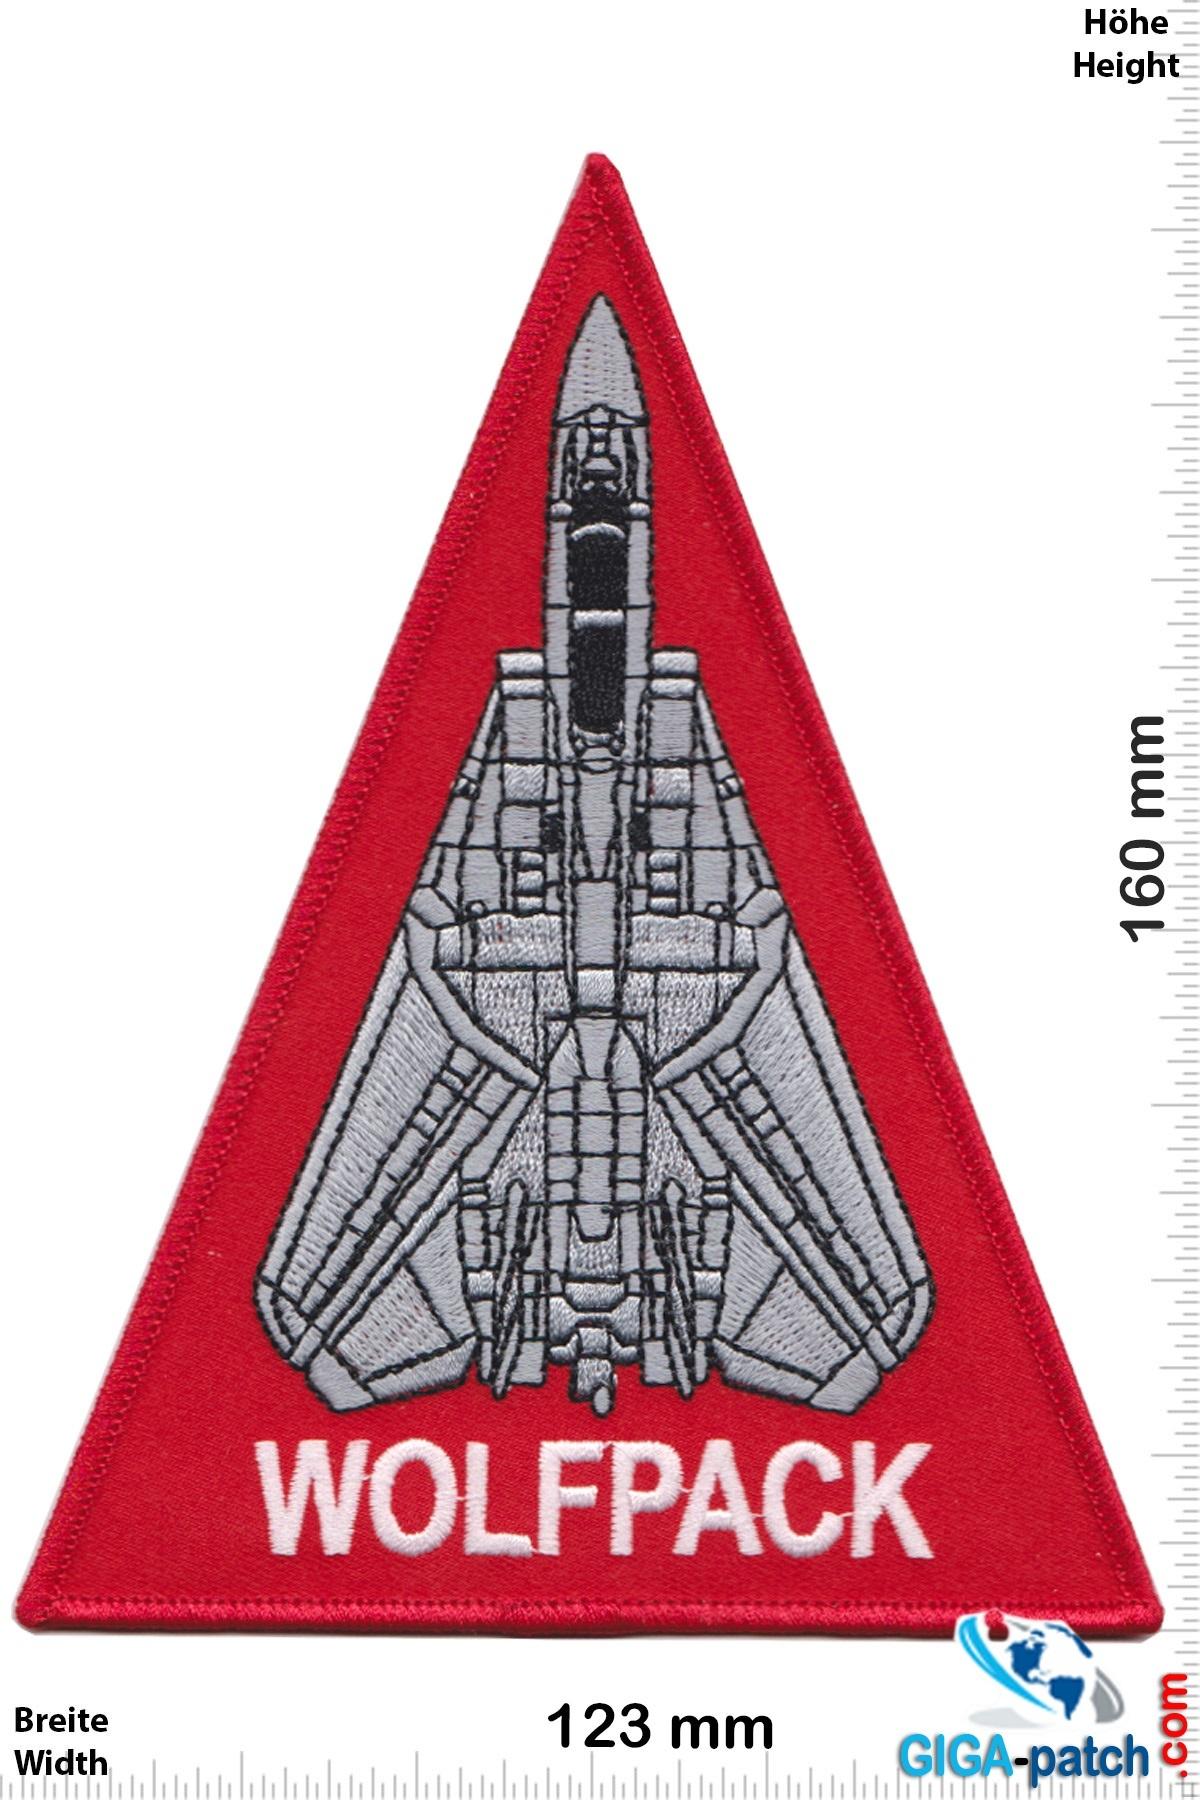 U.S. Navy USN VF-1 WOLFPACK - HQ